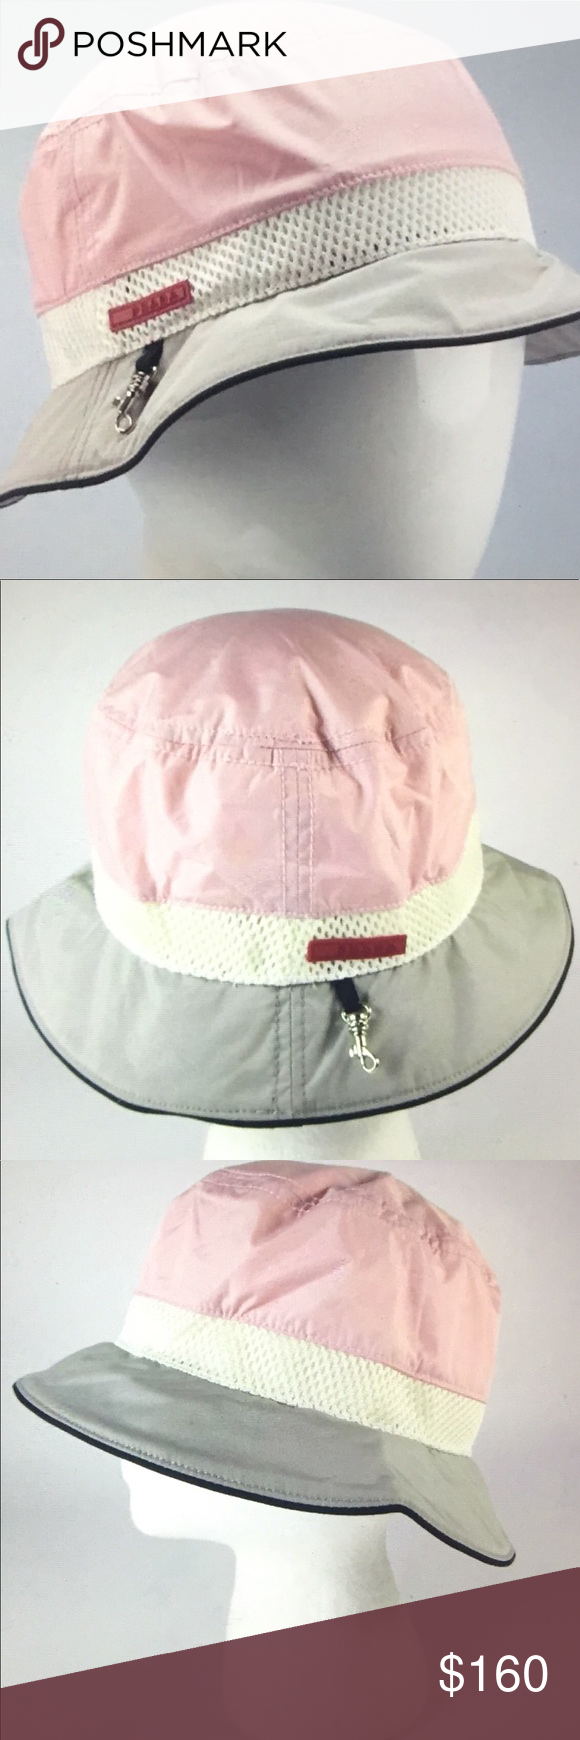 881caee5c12 🆕 Prada Logo Bucket Hat